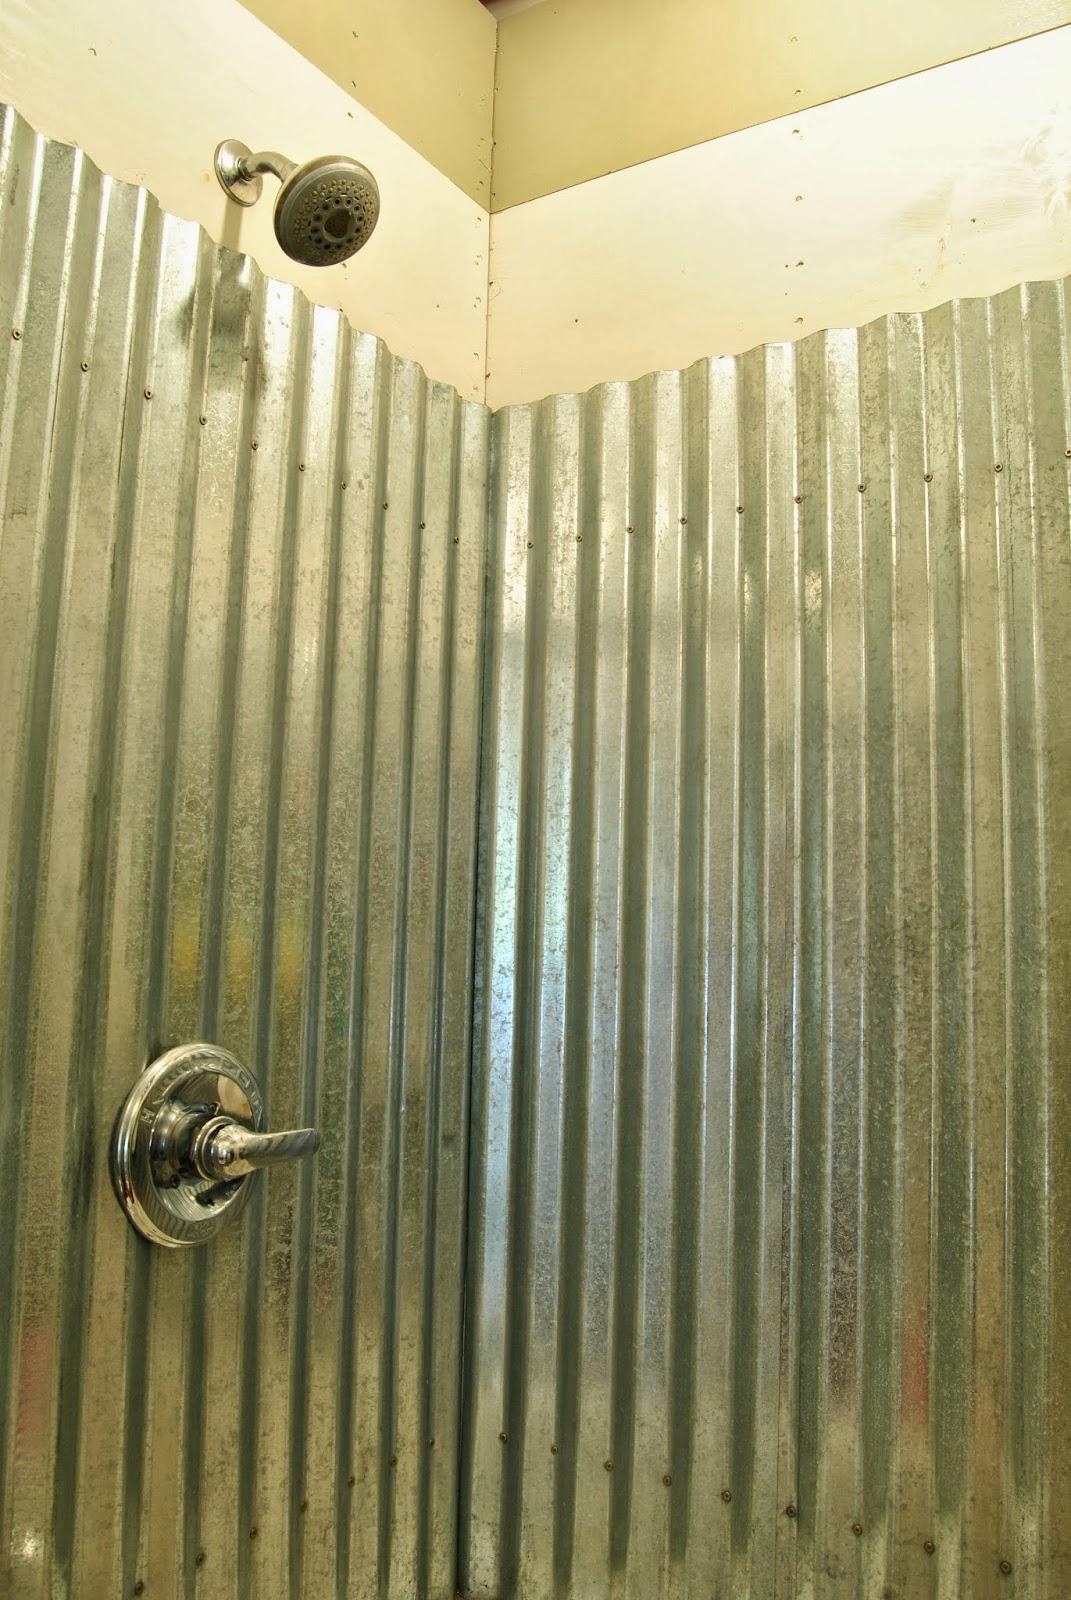 Metal tiles for backsplash and bathroom   Bravotti.com